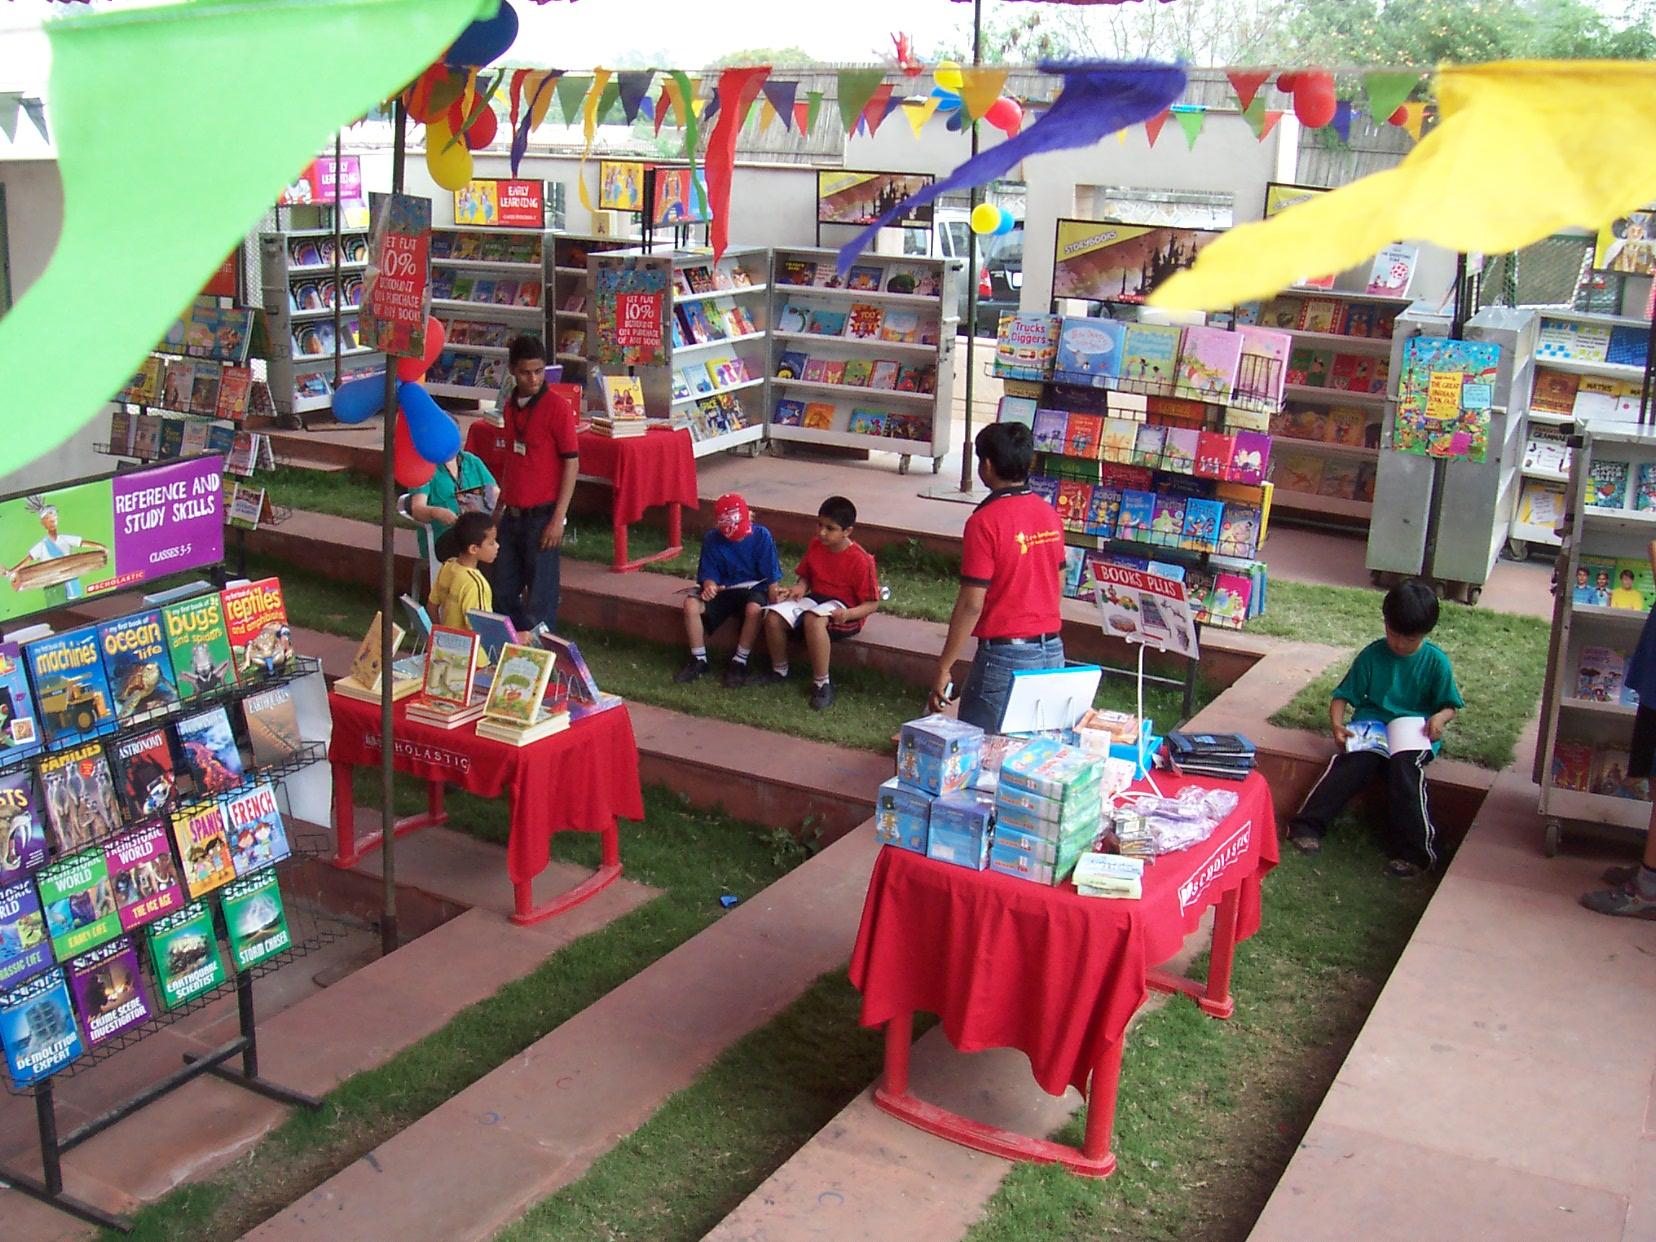 The Scholastic Book Fair Experience India